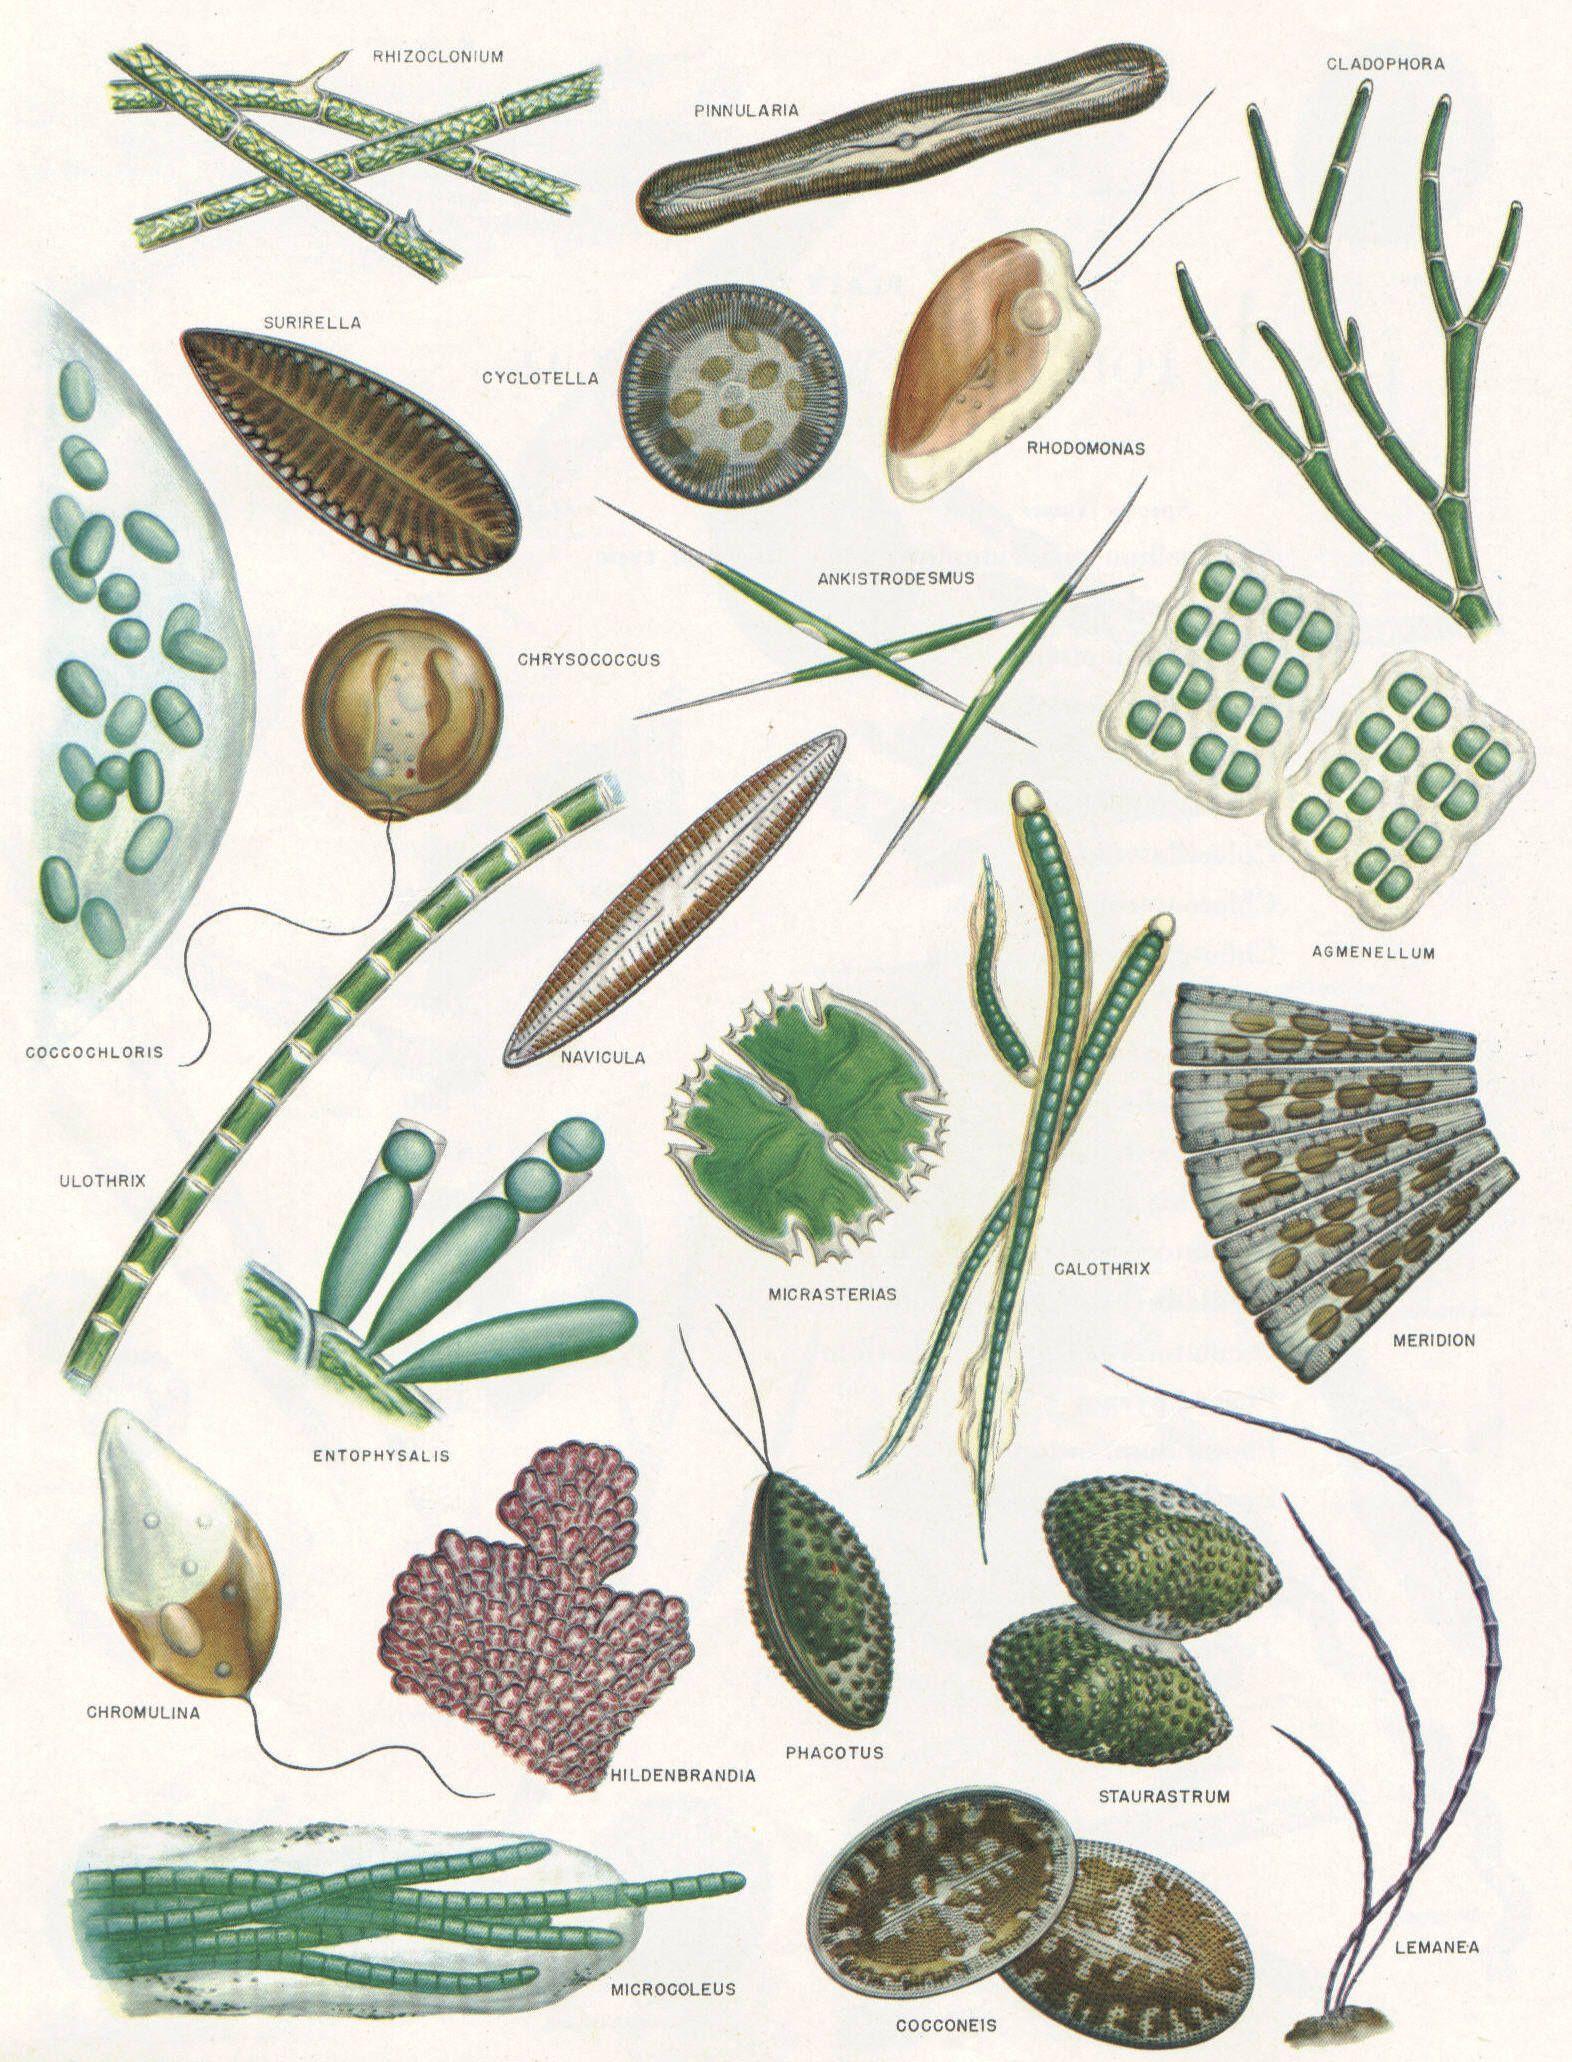 Aquatic Management Llc Biology Plants Microscopic Photography Scientific Illustration [ 2062 x 1572 Pixel ]